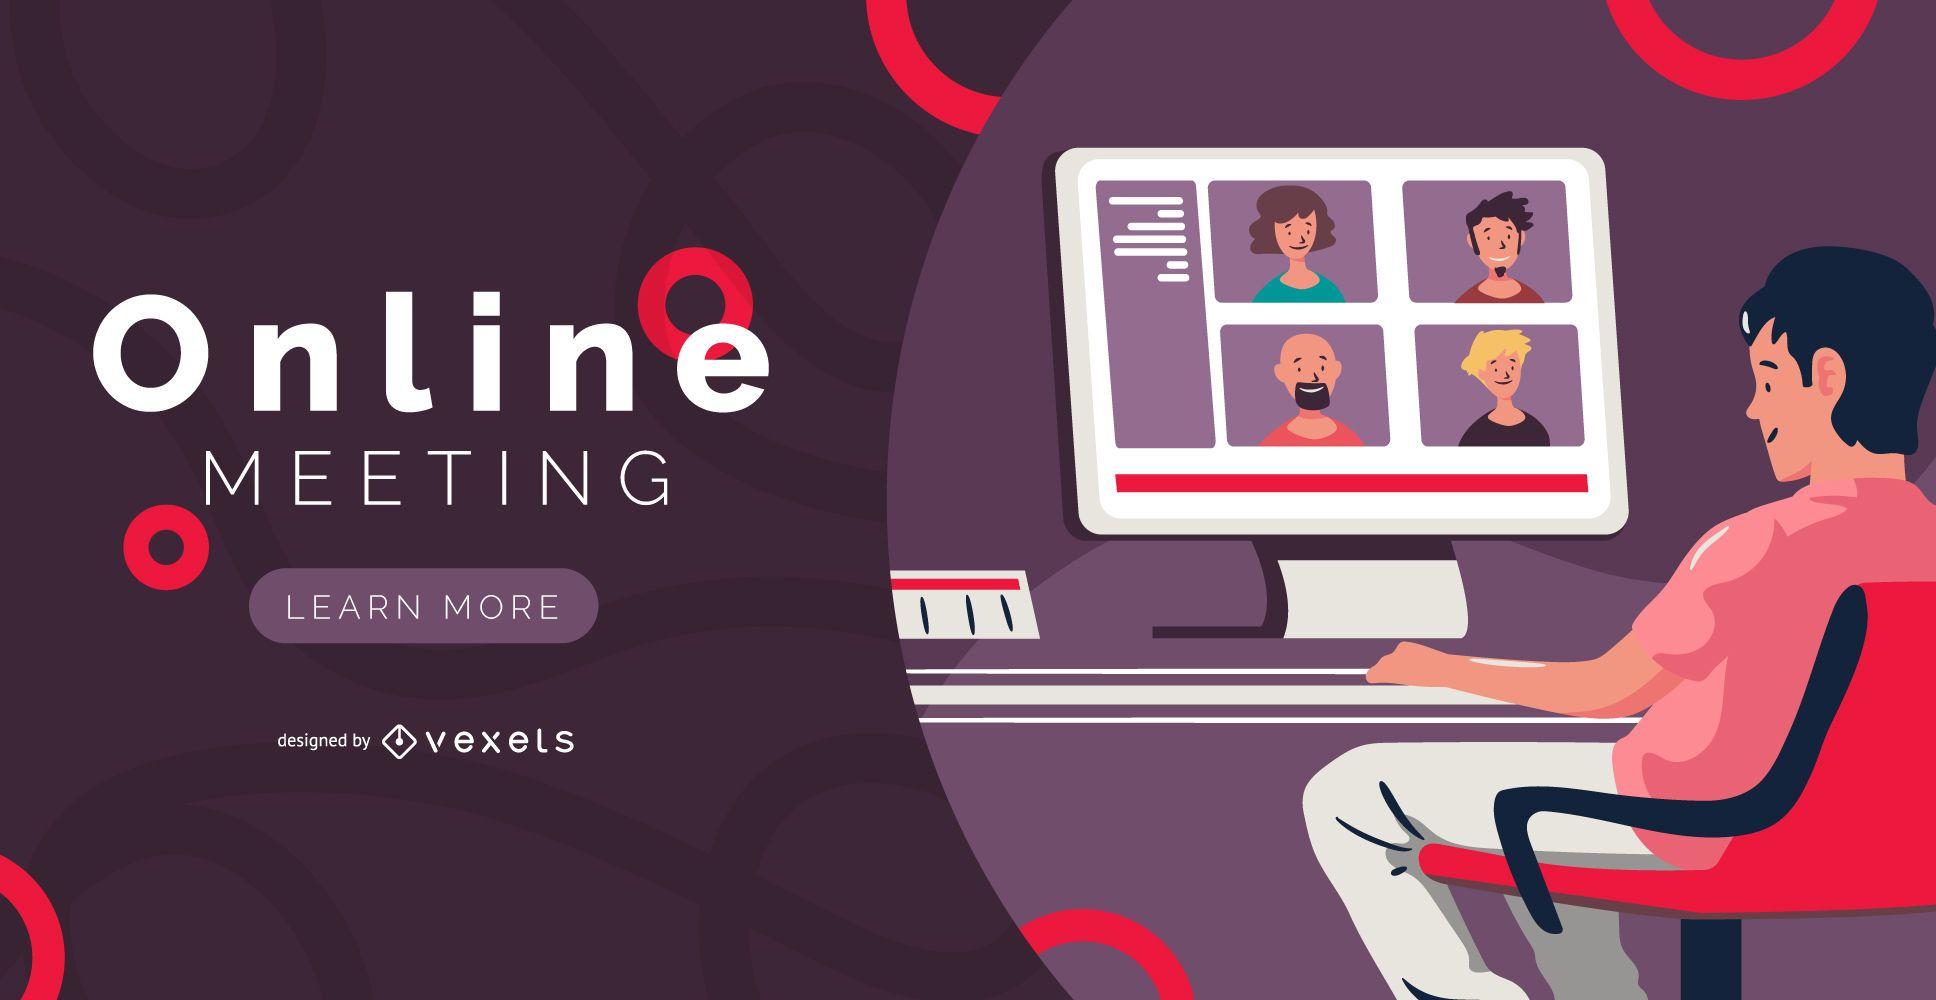 Online Meeting Banner Design